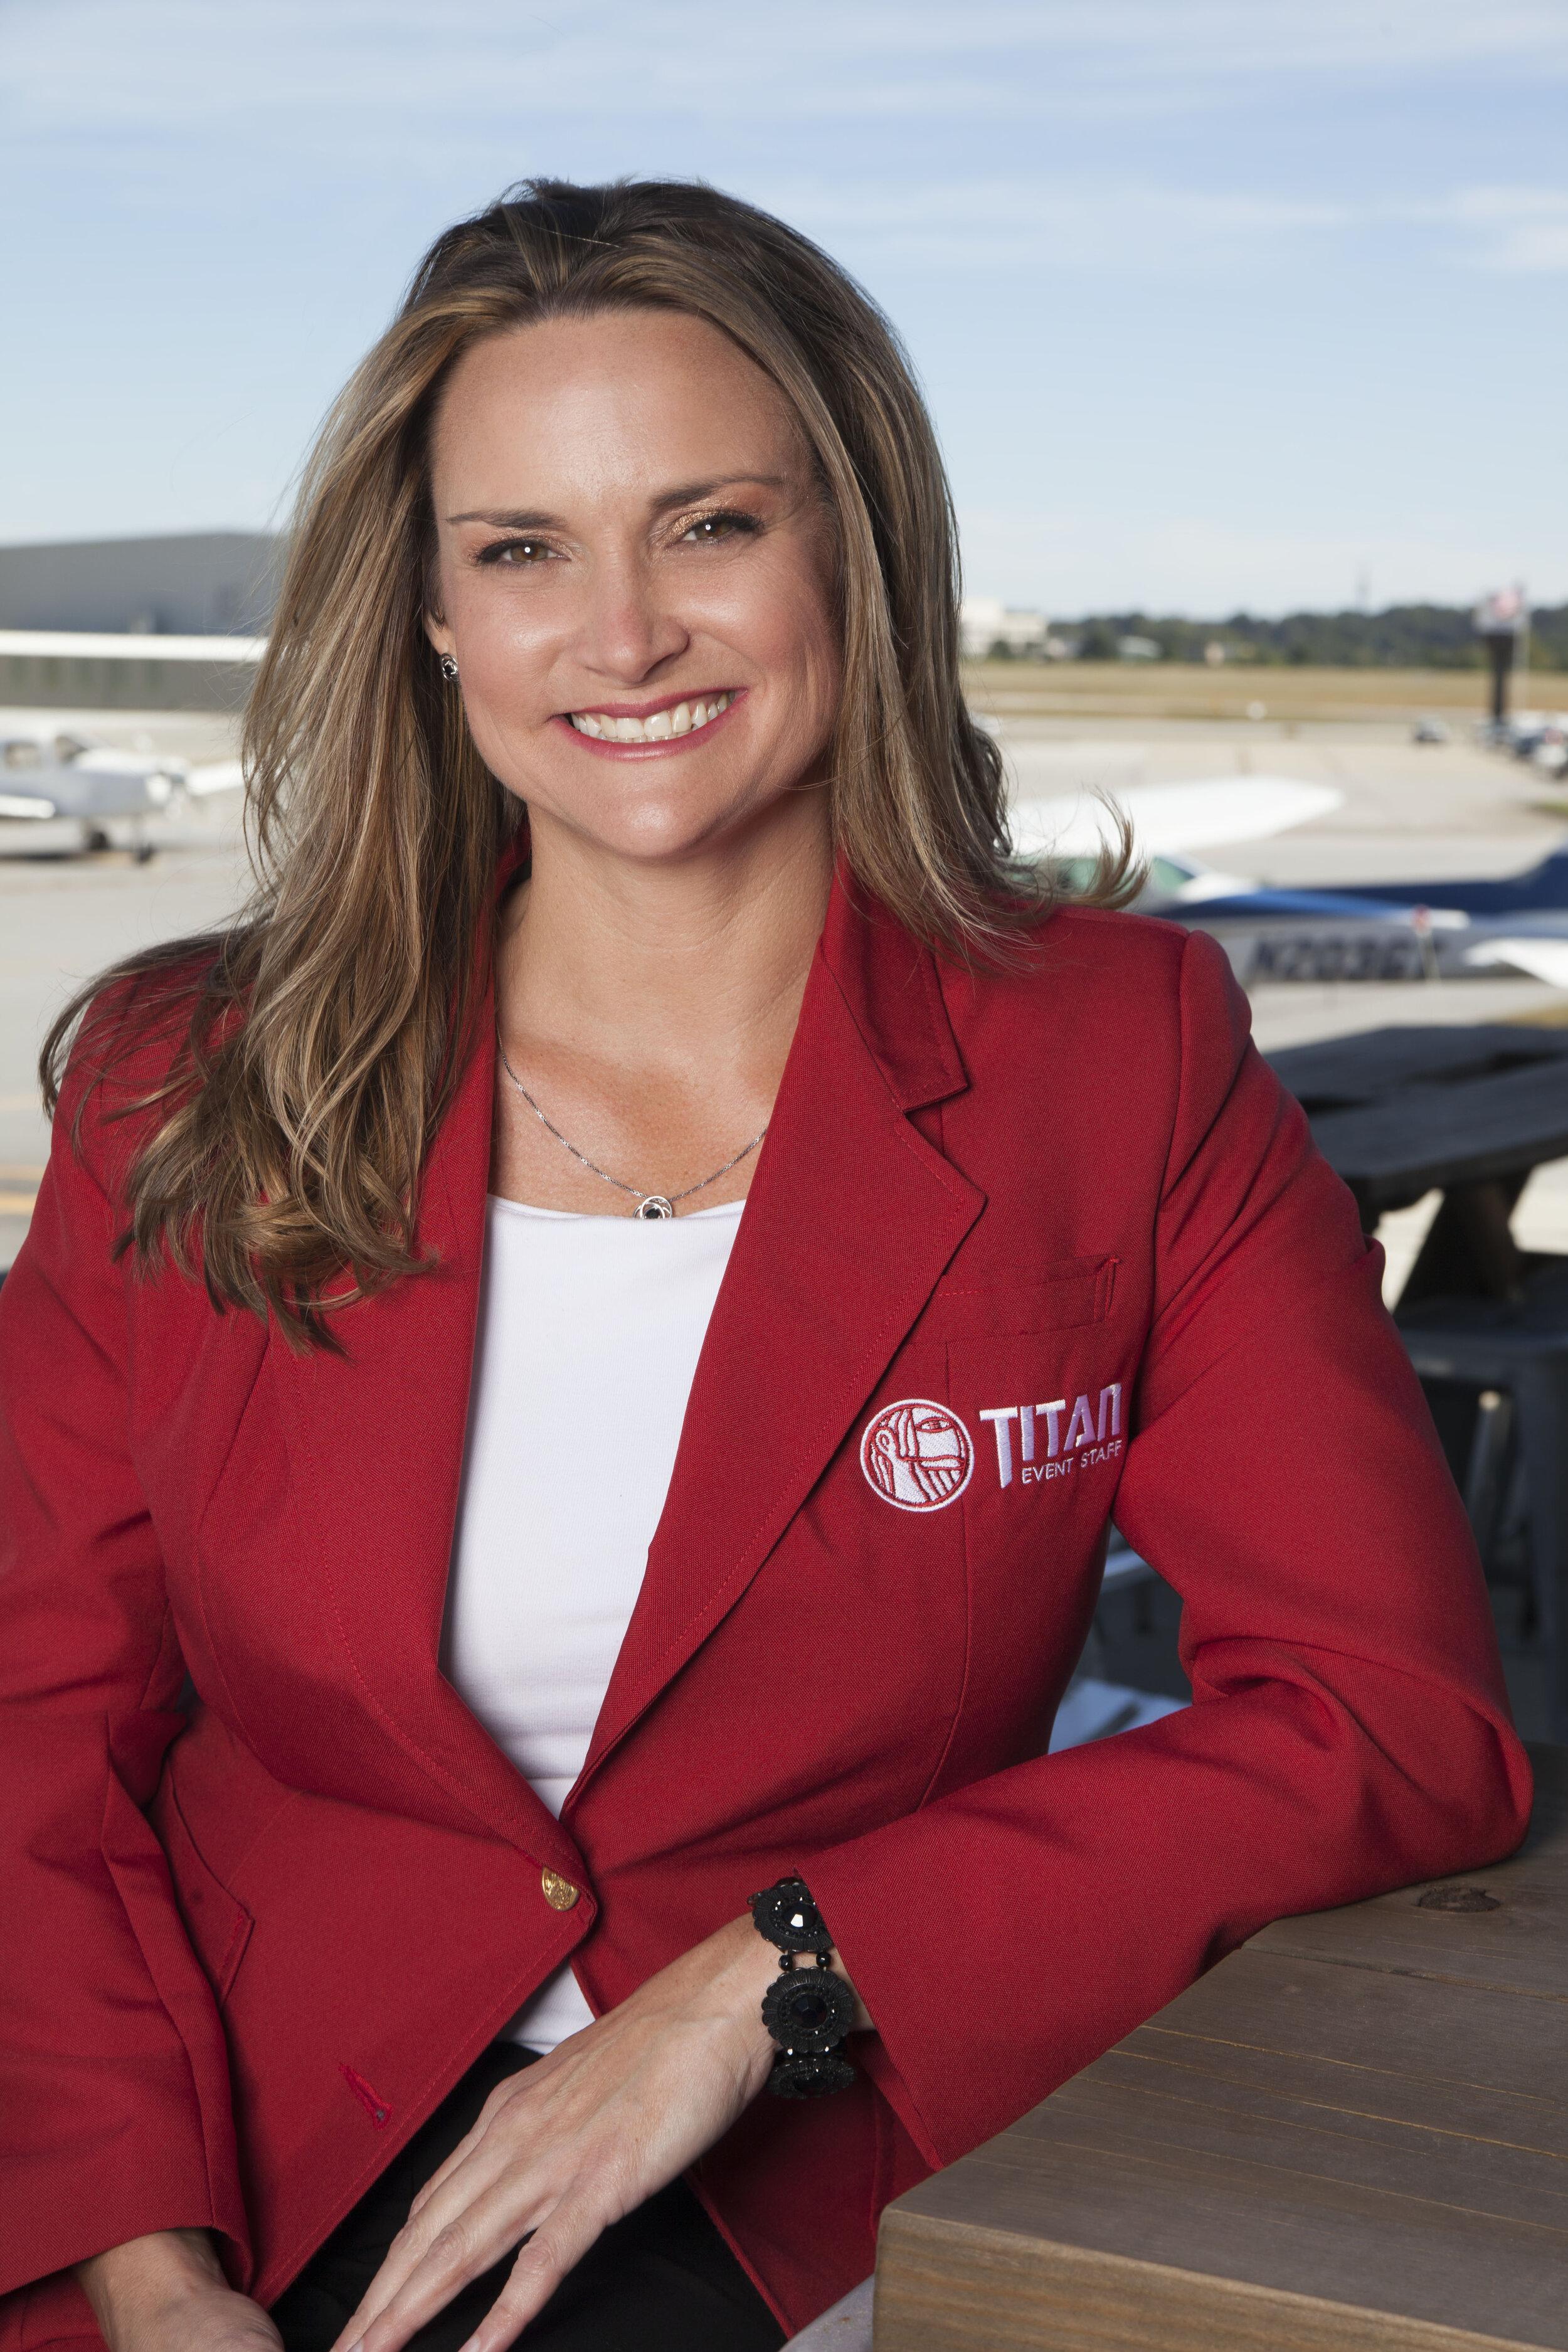 Founder Titan Global Enterprises